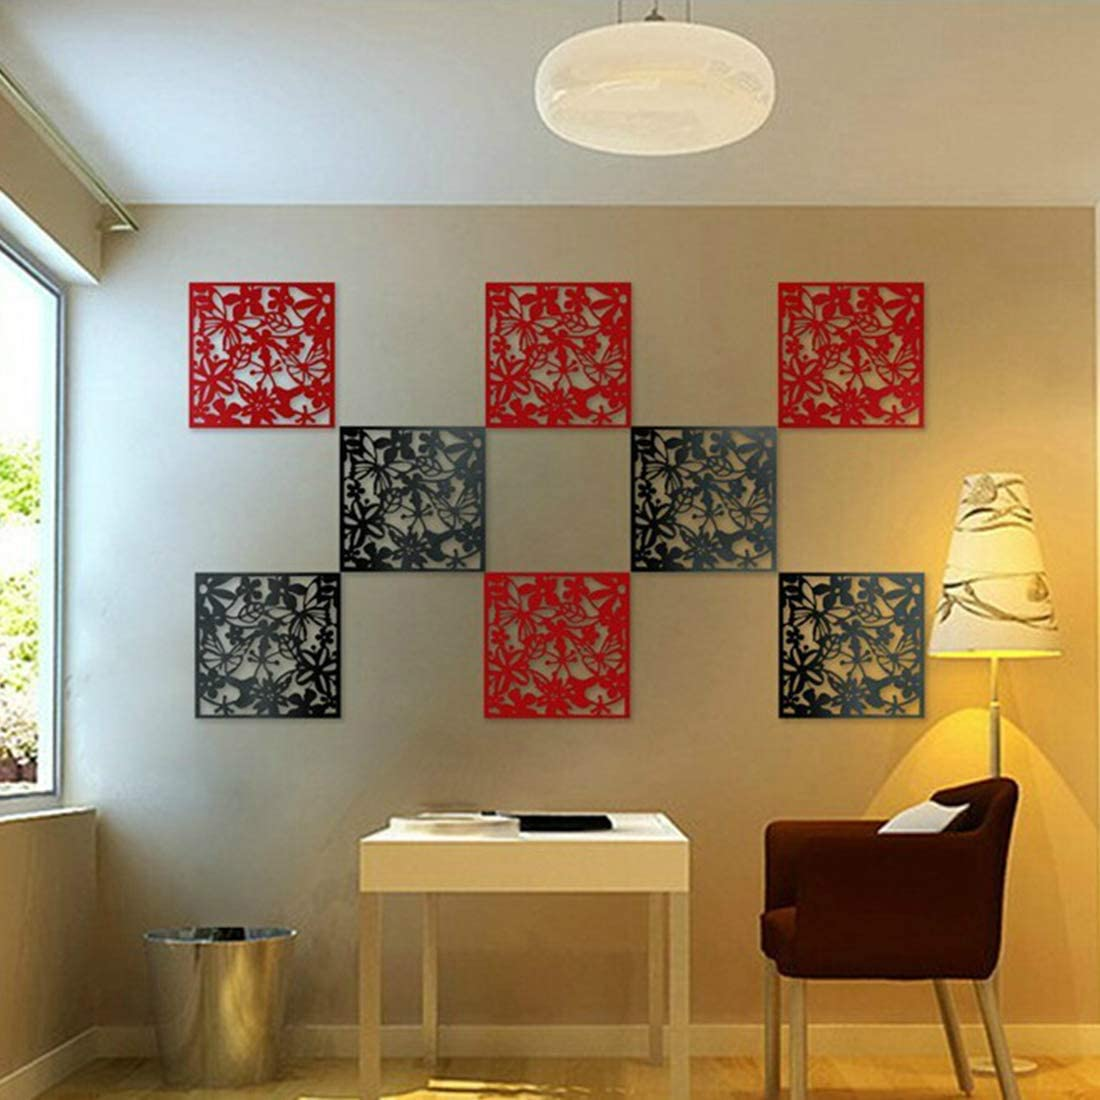 Black, 4 Pcs MAFAGE Hanging Divider Screens Panel DIY Room Splitter Panel Decorative for Hotel Home Bar Room 40 x 40cm